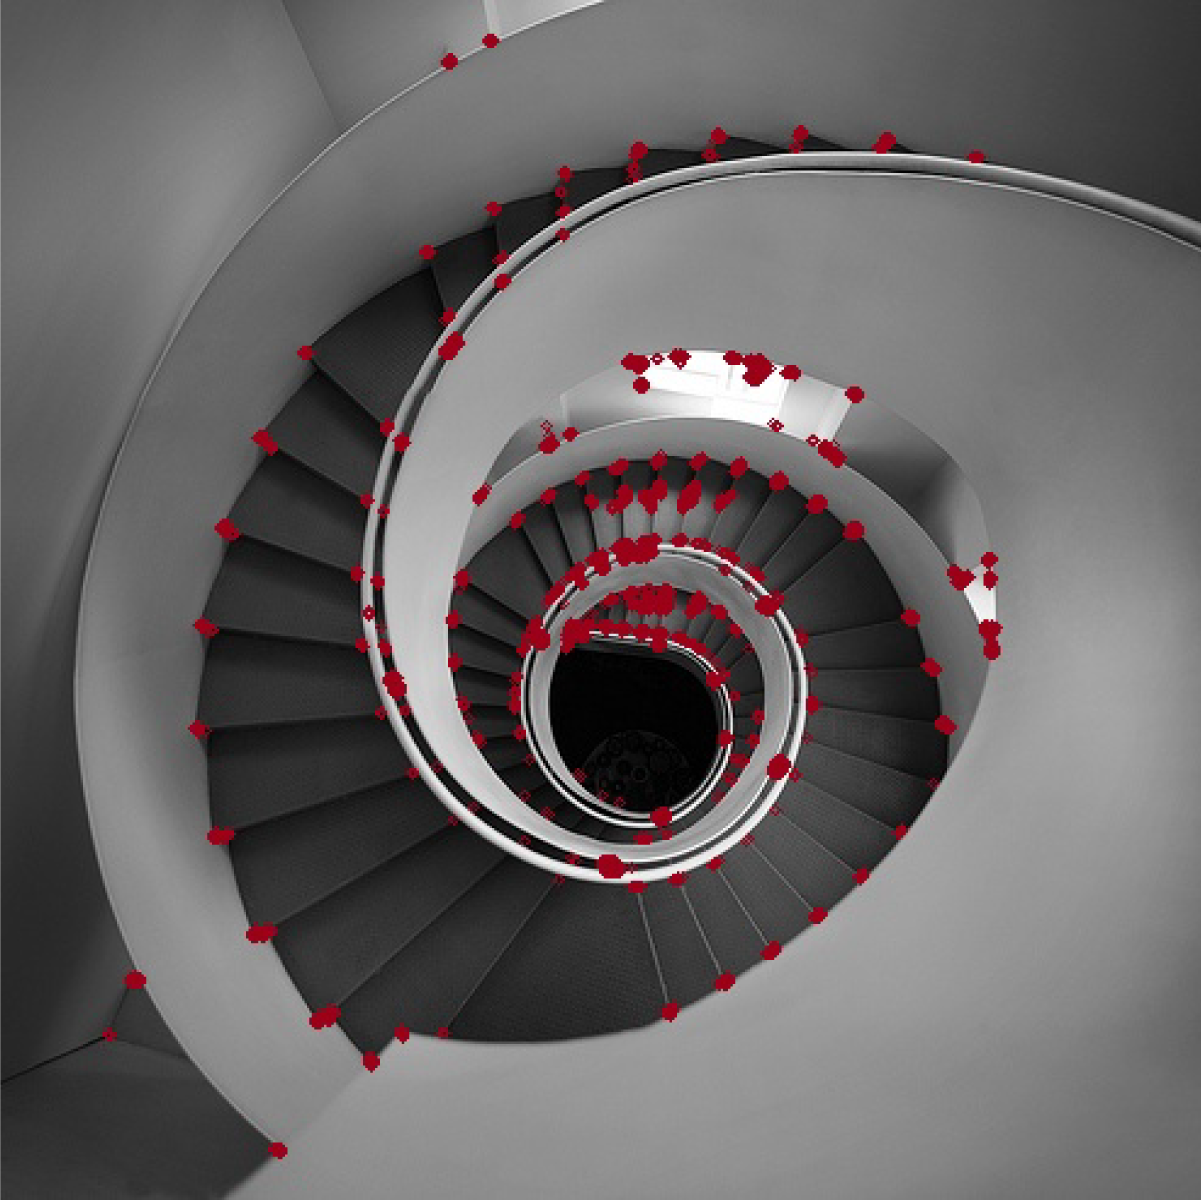 Corner Detection using Image Processing